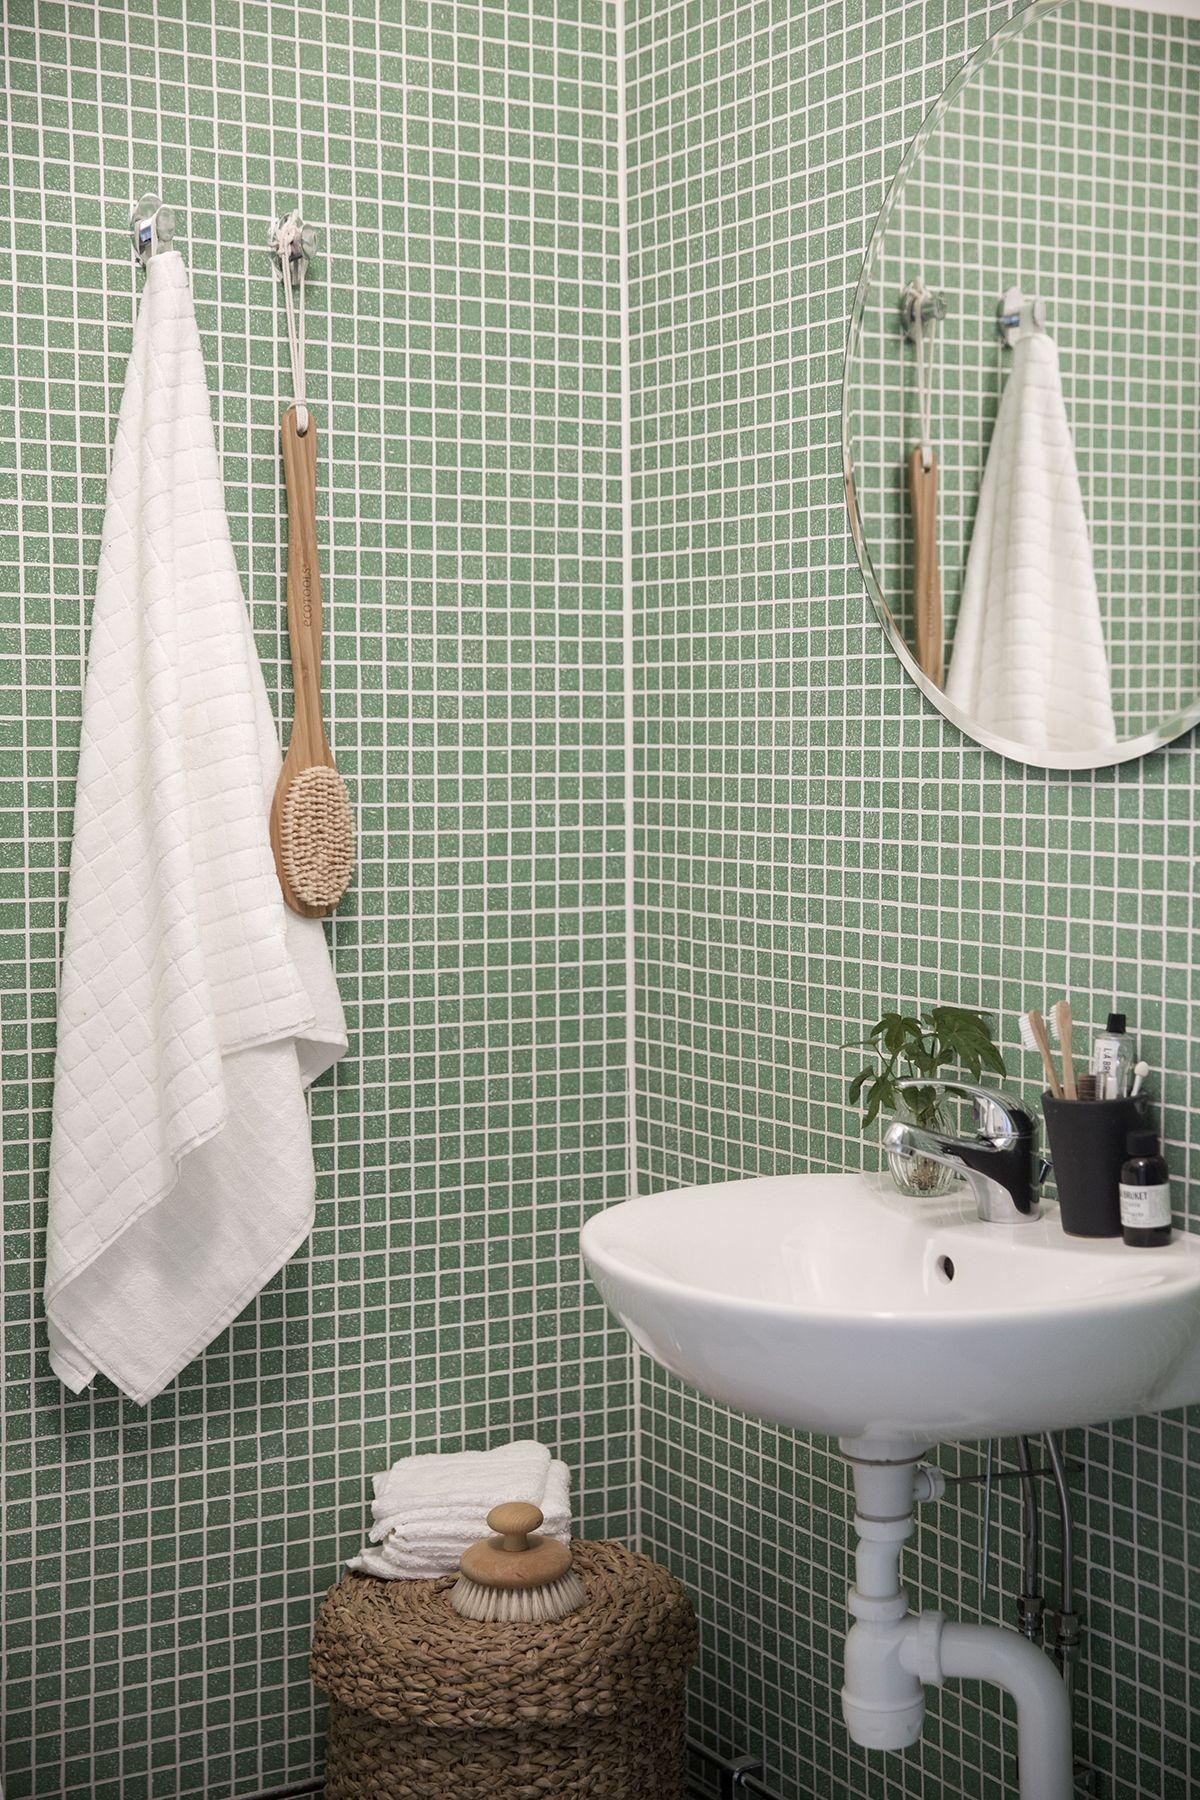 Sfdc23ba09cbd874b73806c540e5cd81c95 bathrooms for Mosaic bathroom bin